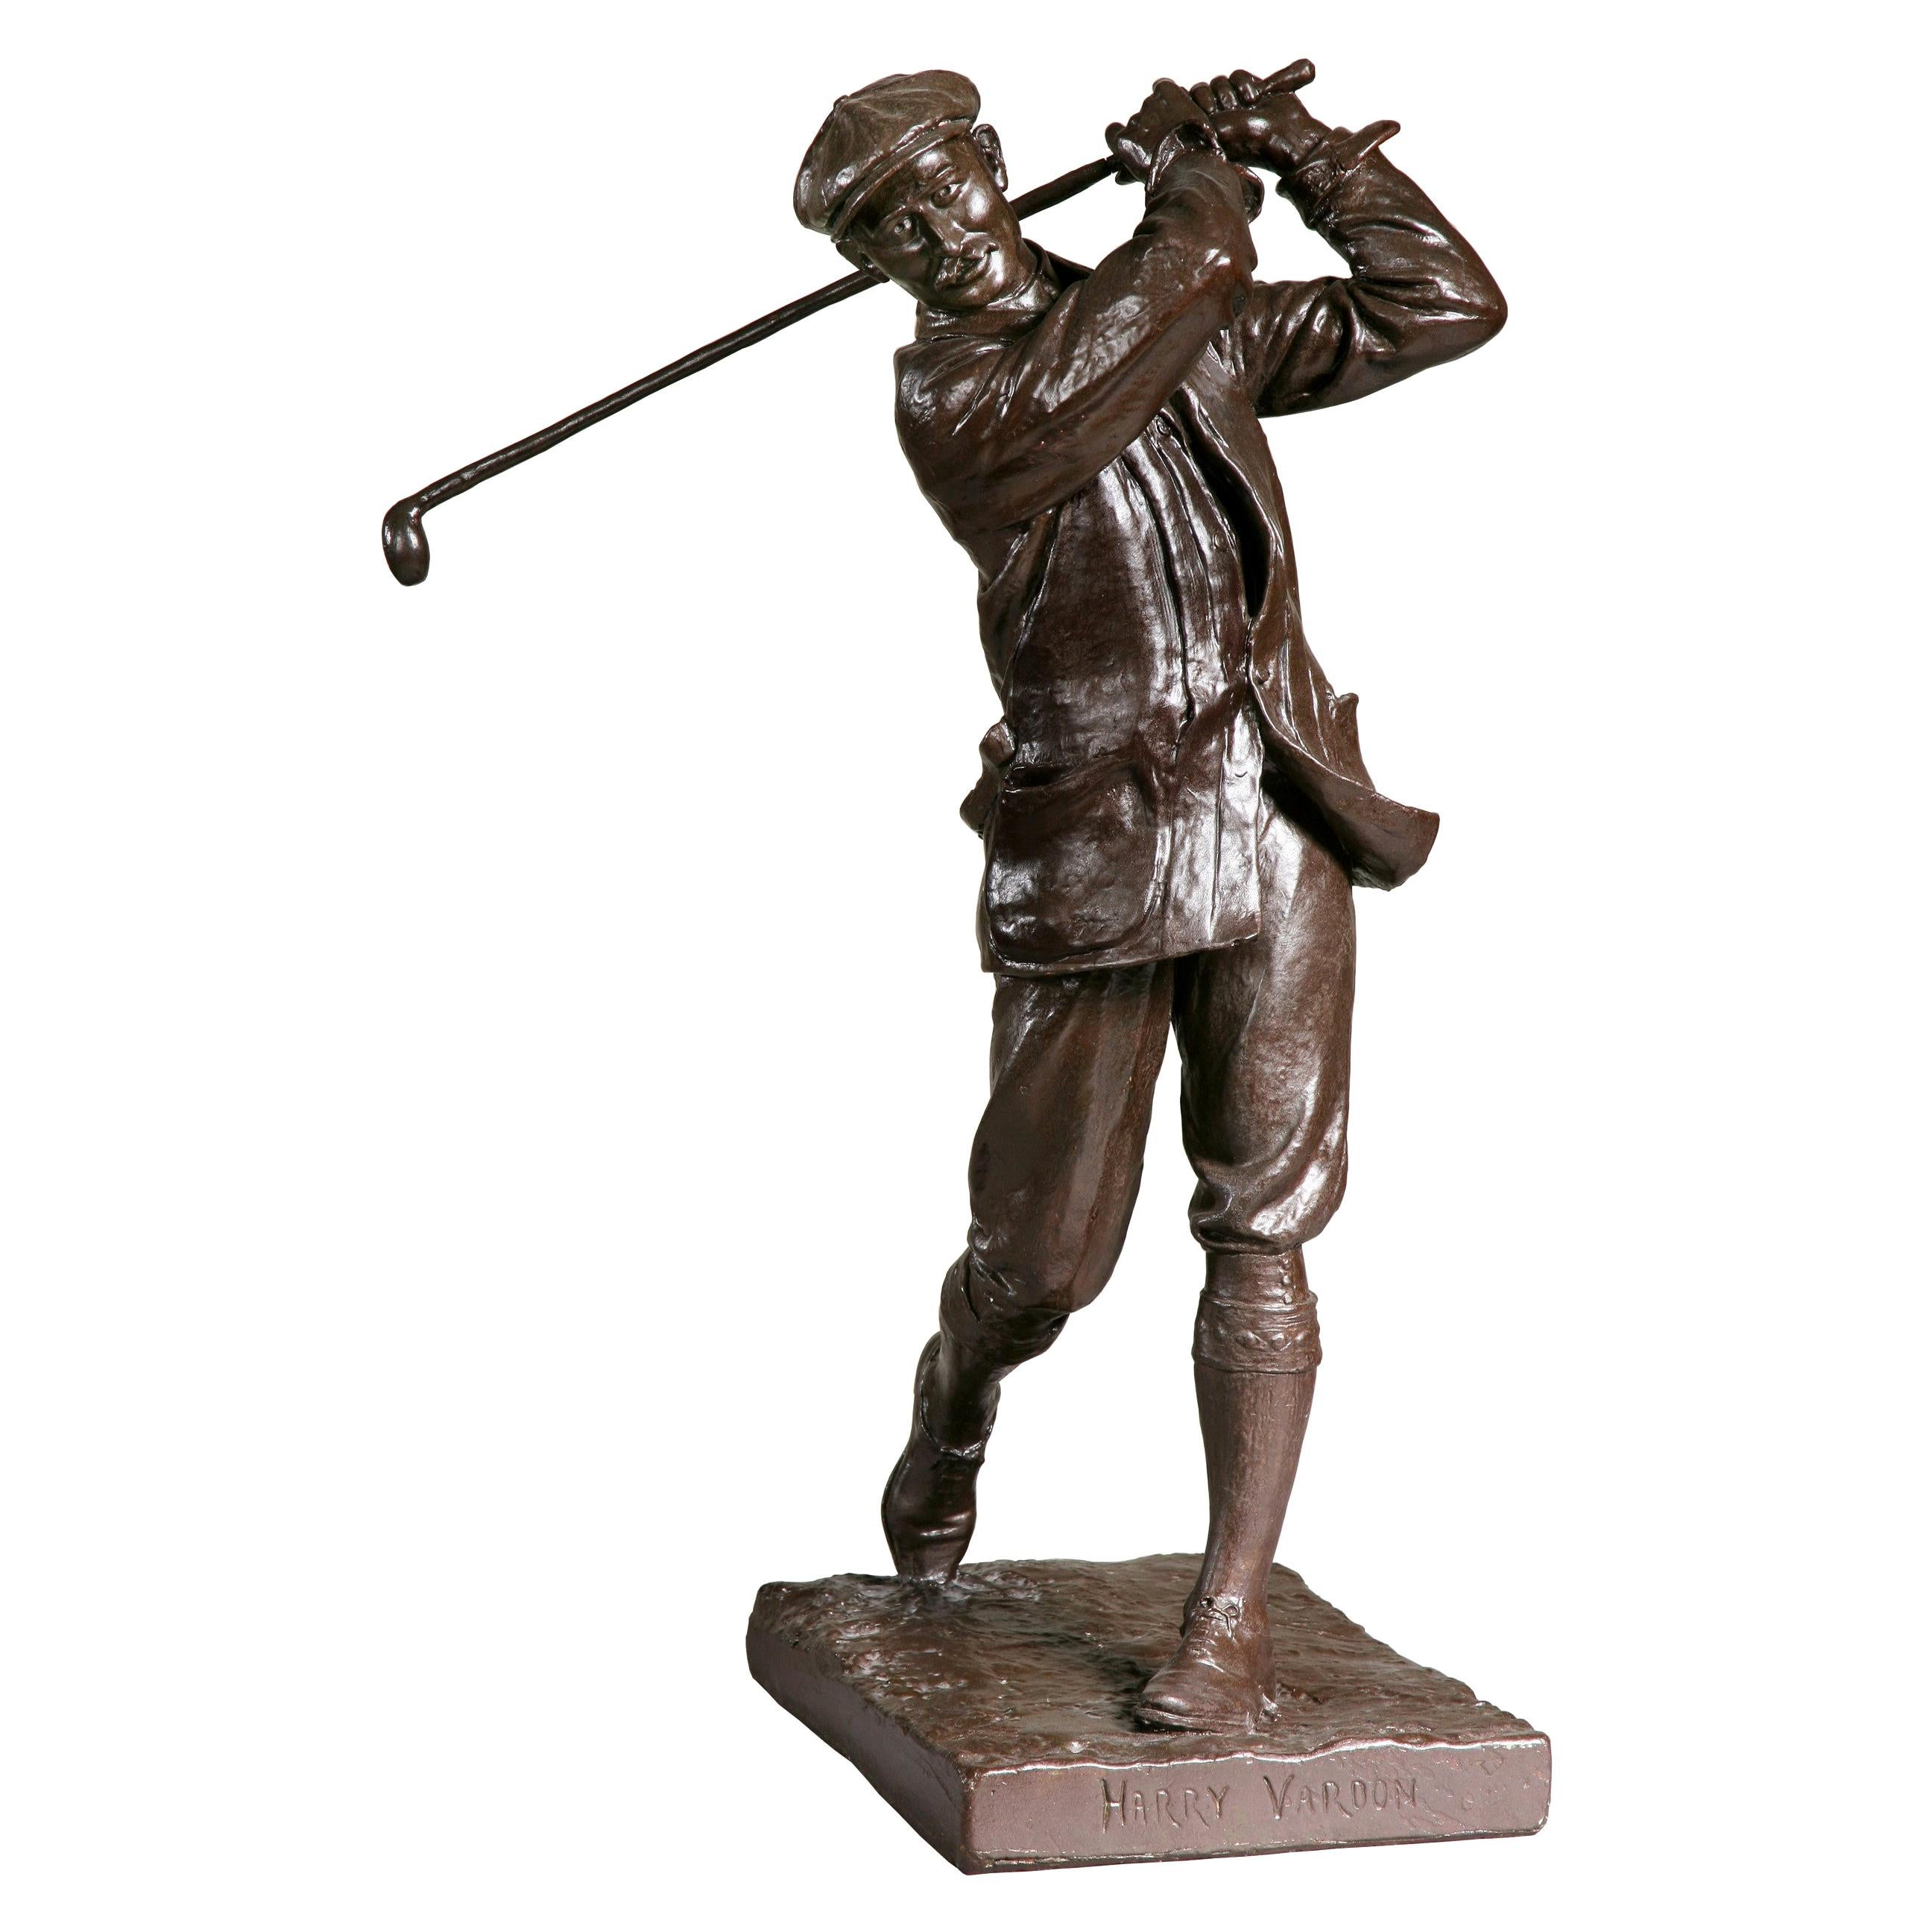 Antique Golf Figure of Harry Vardon, Champion Golfer by Hal Ludlow